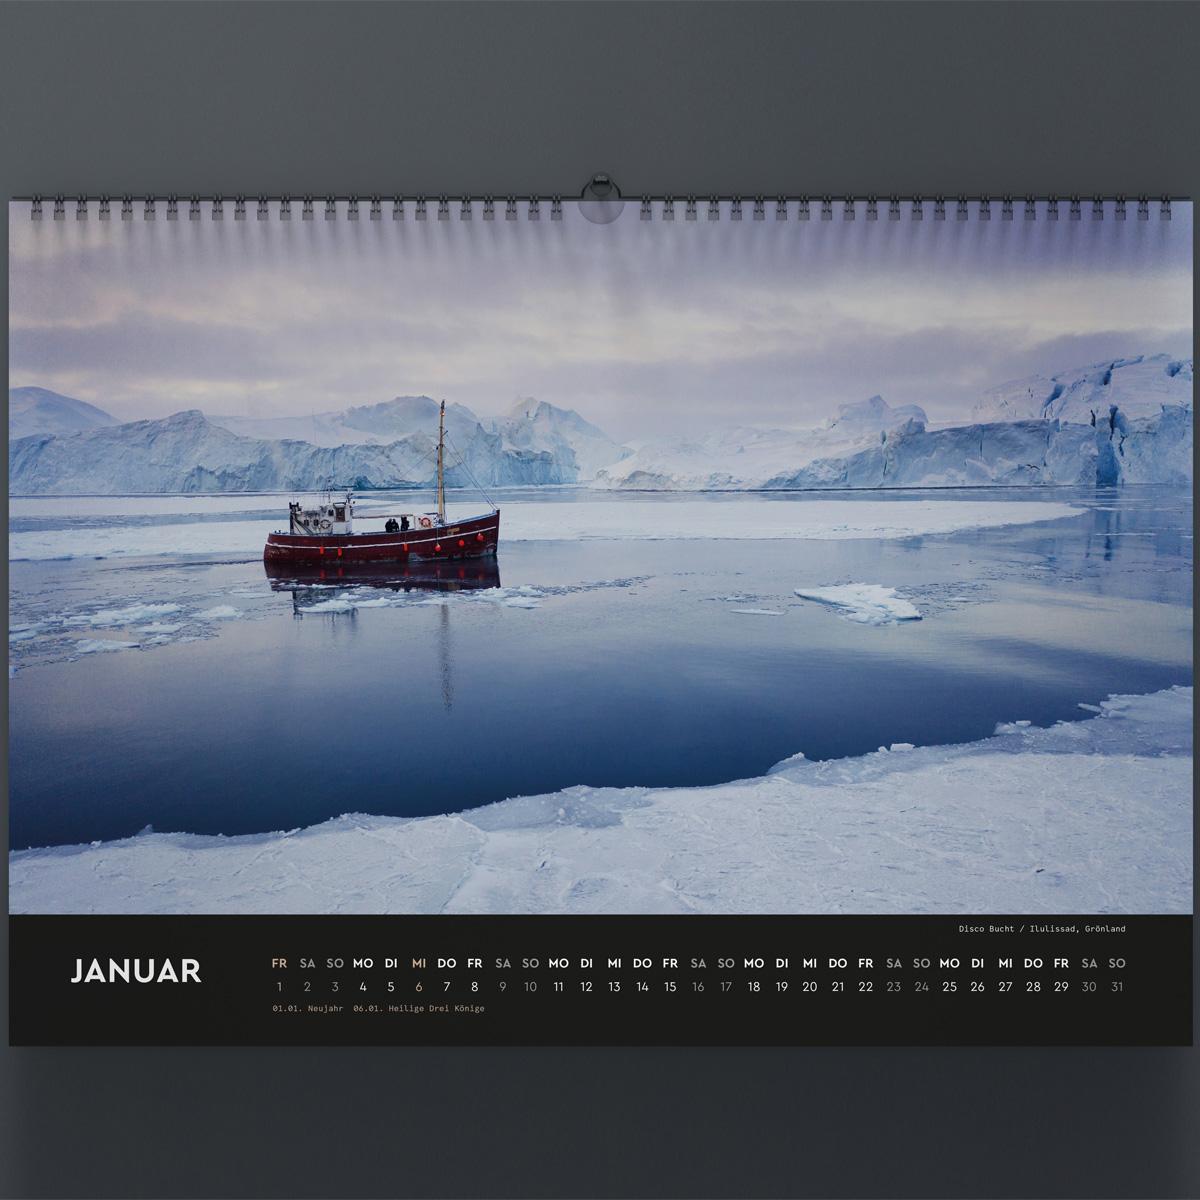 Bild von Tobias Woggon - The Spirit of Traveling 2021 Wandkalender